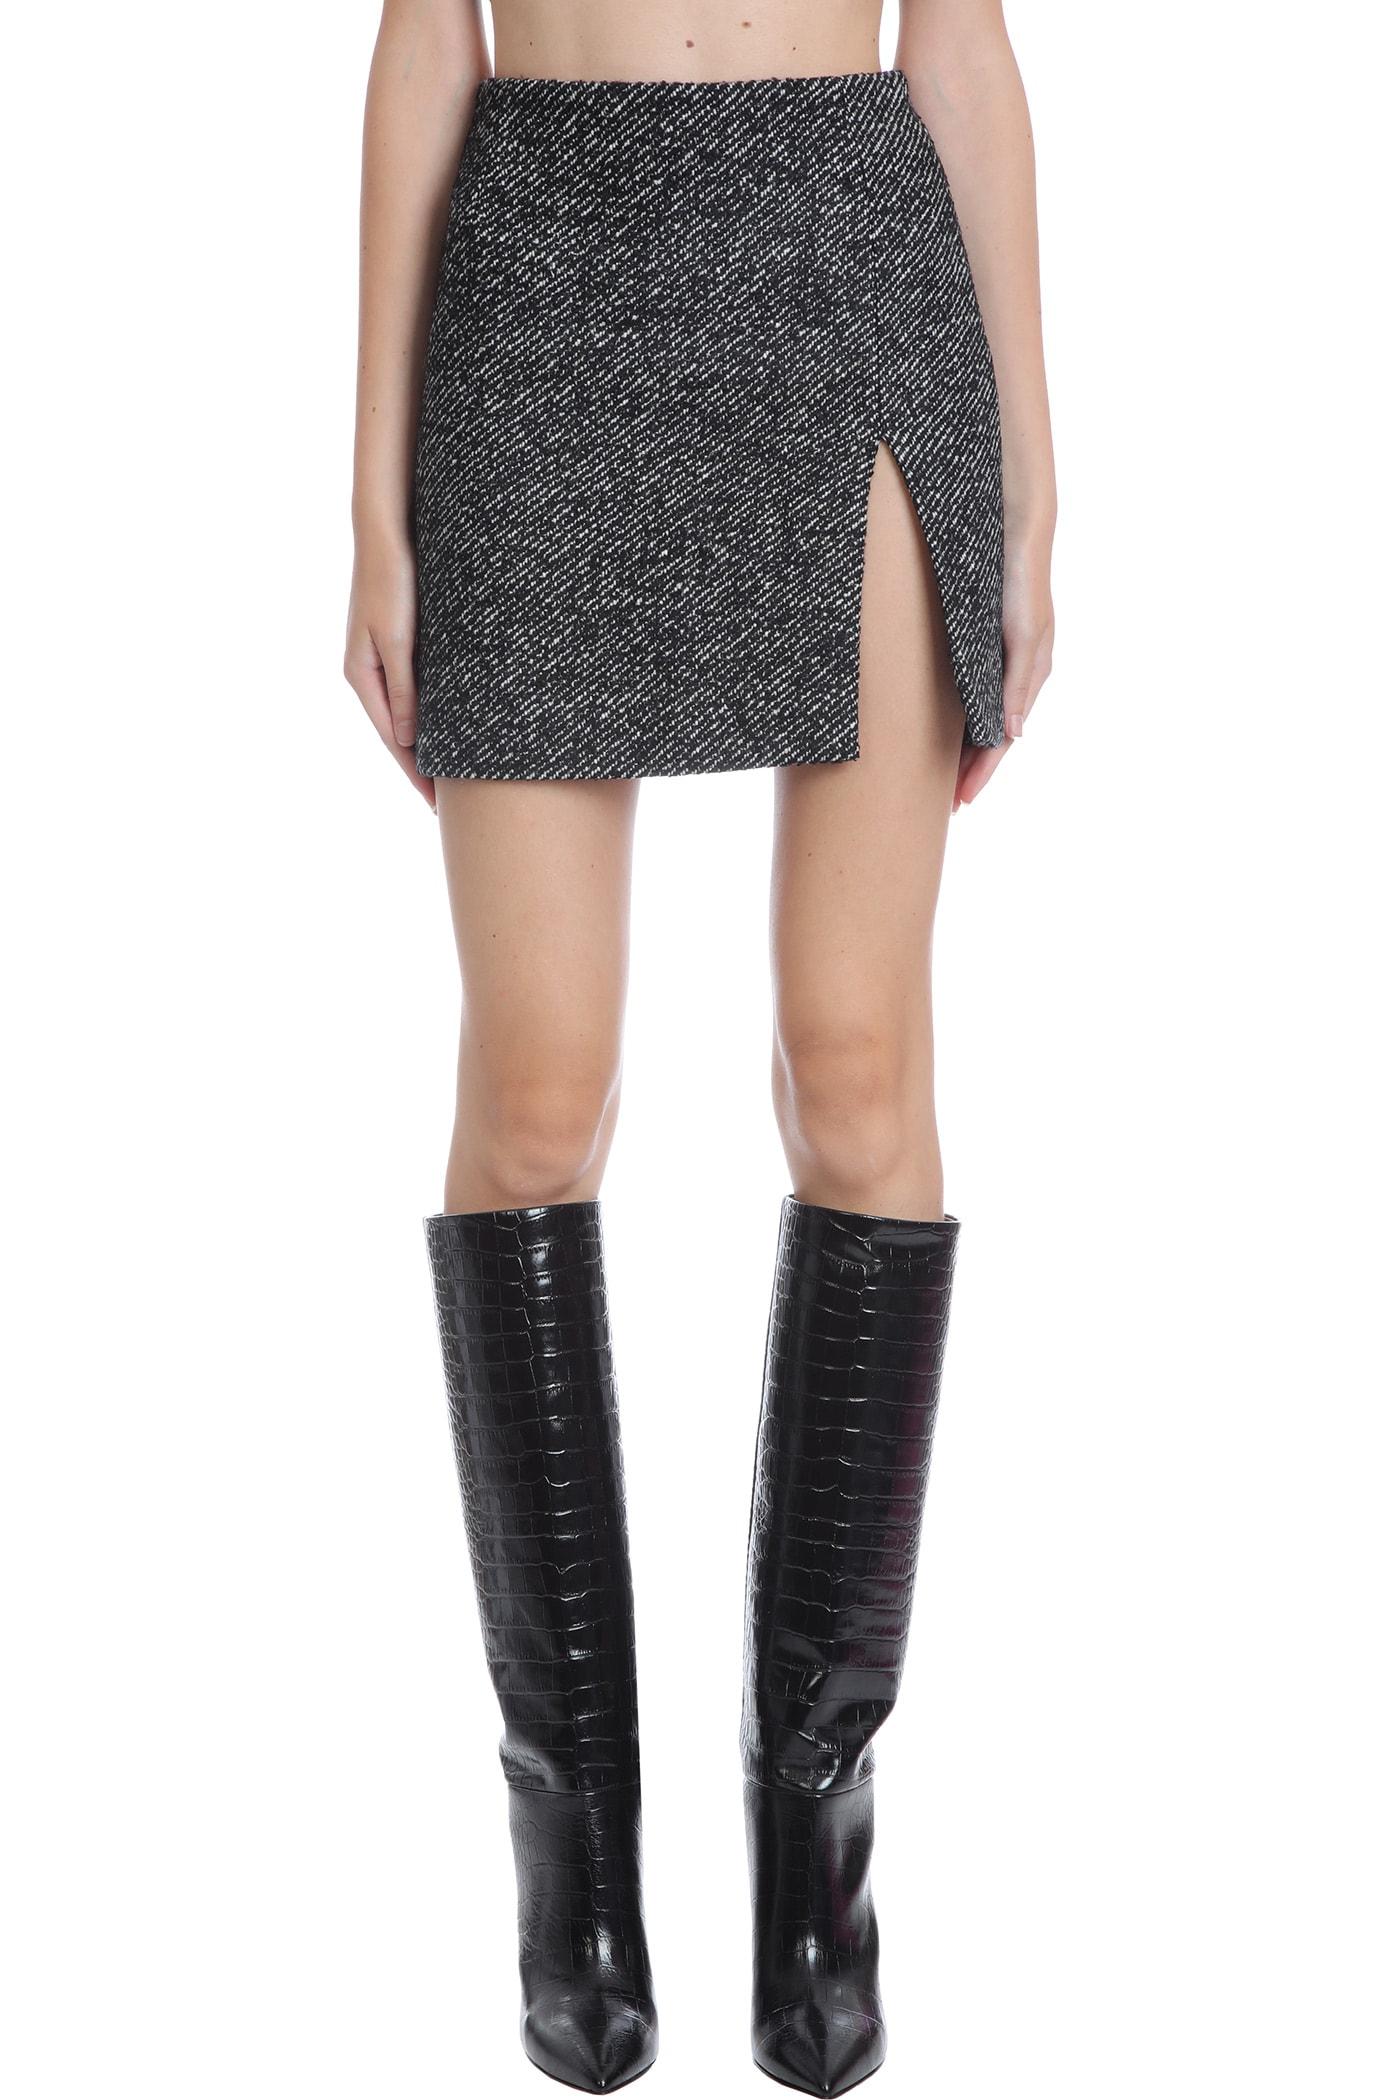 Gioia Splitted Skirt In Black Wool